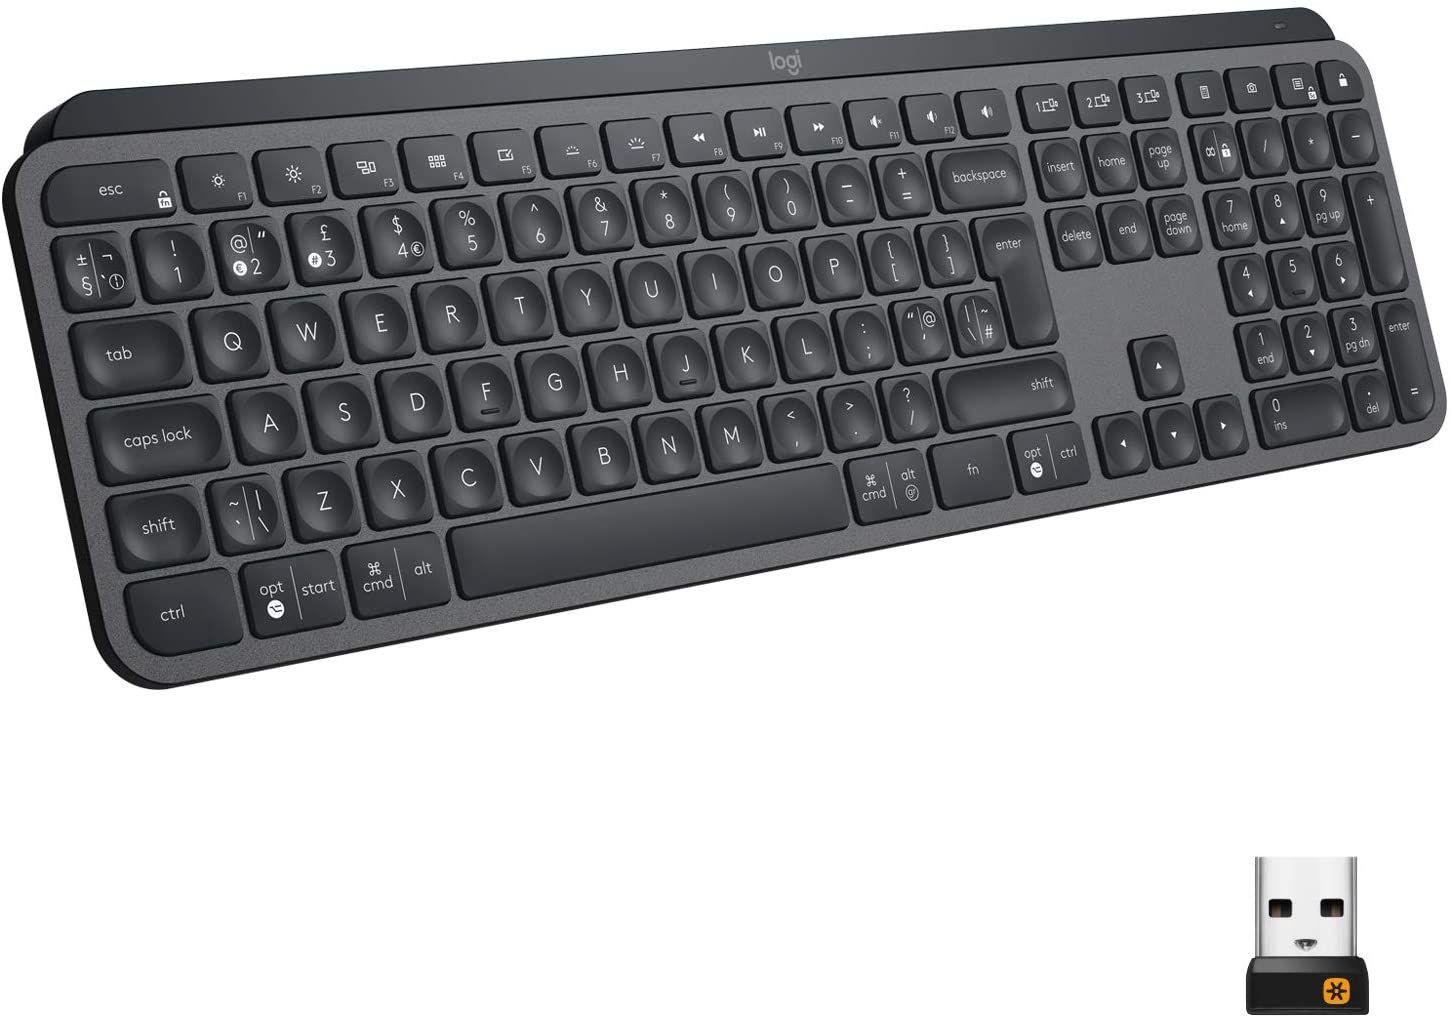 Logitech MX Keys at Amazon for £81.40